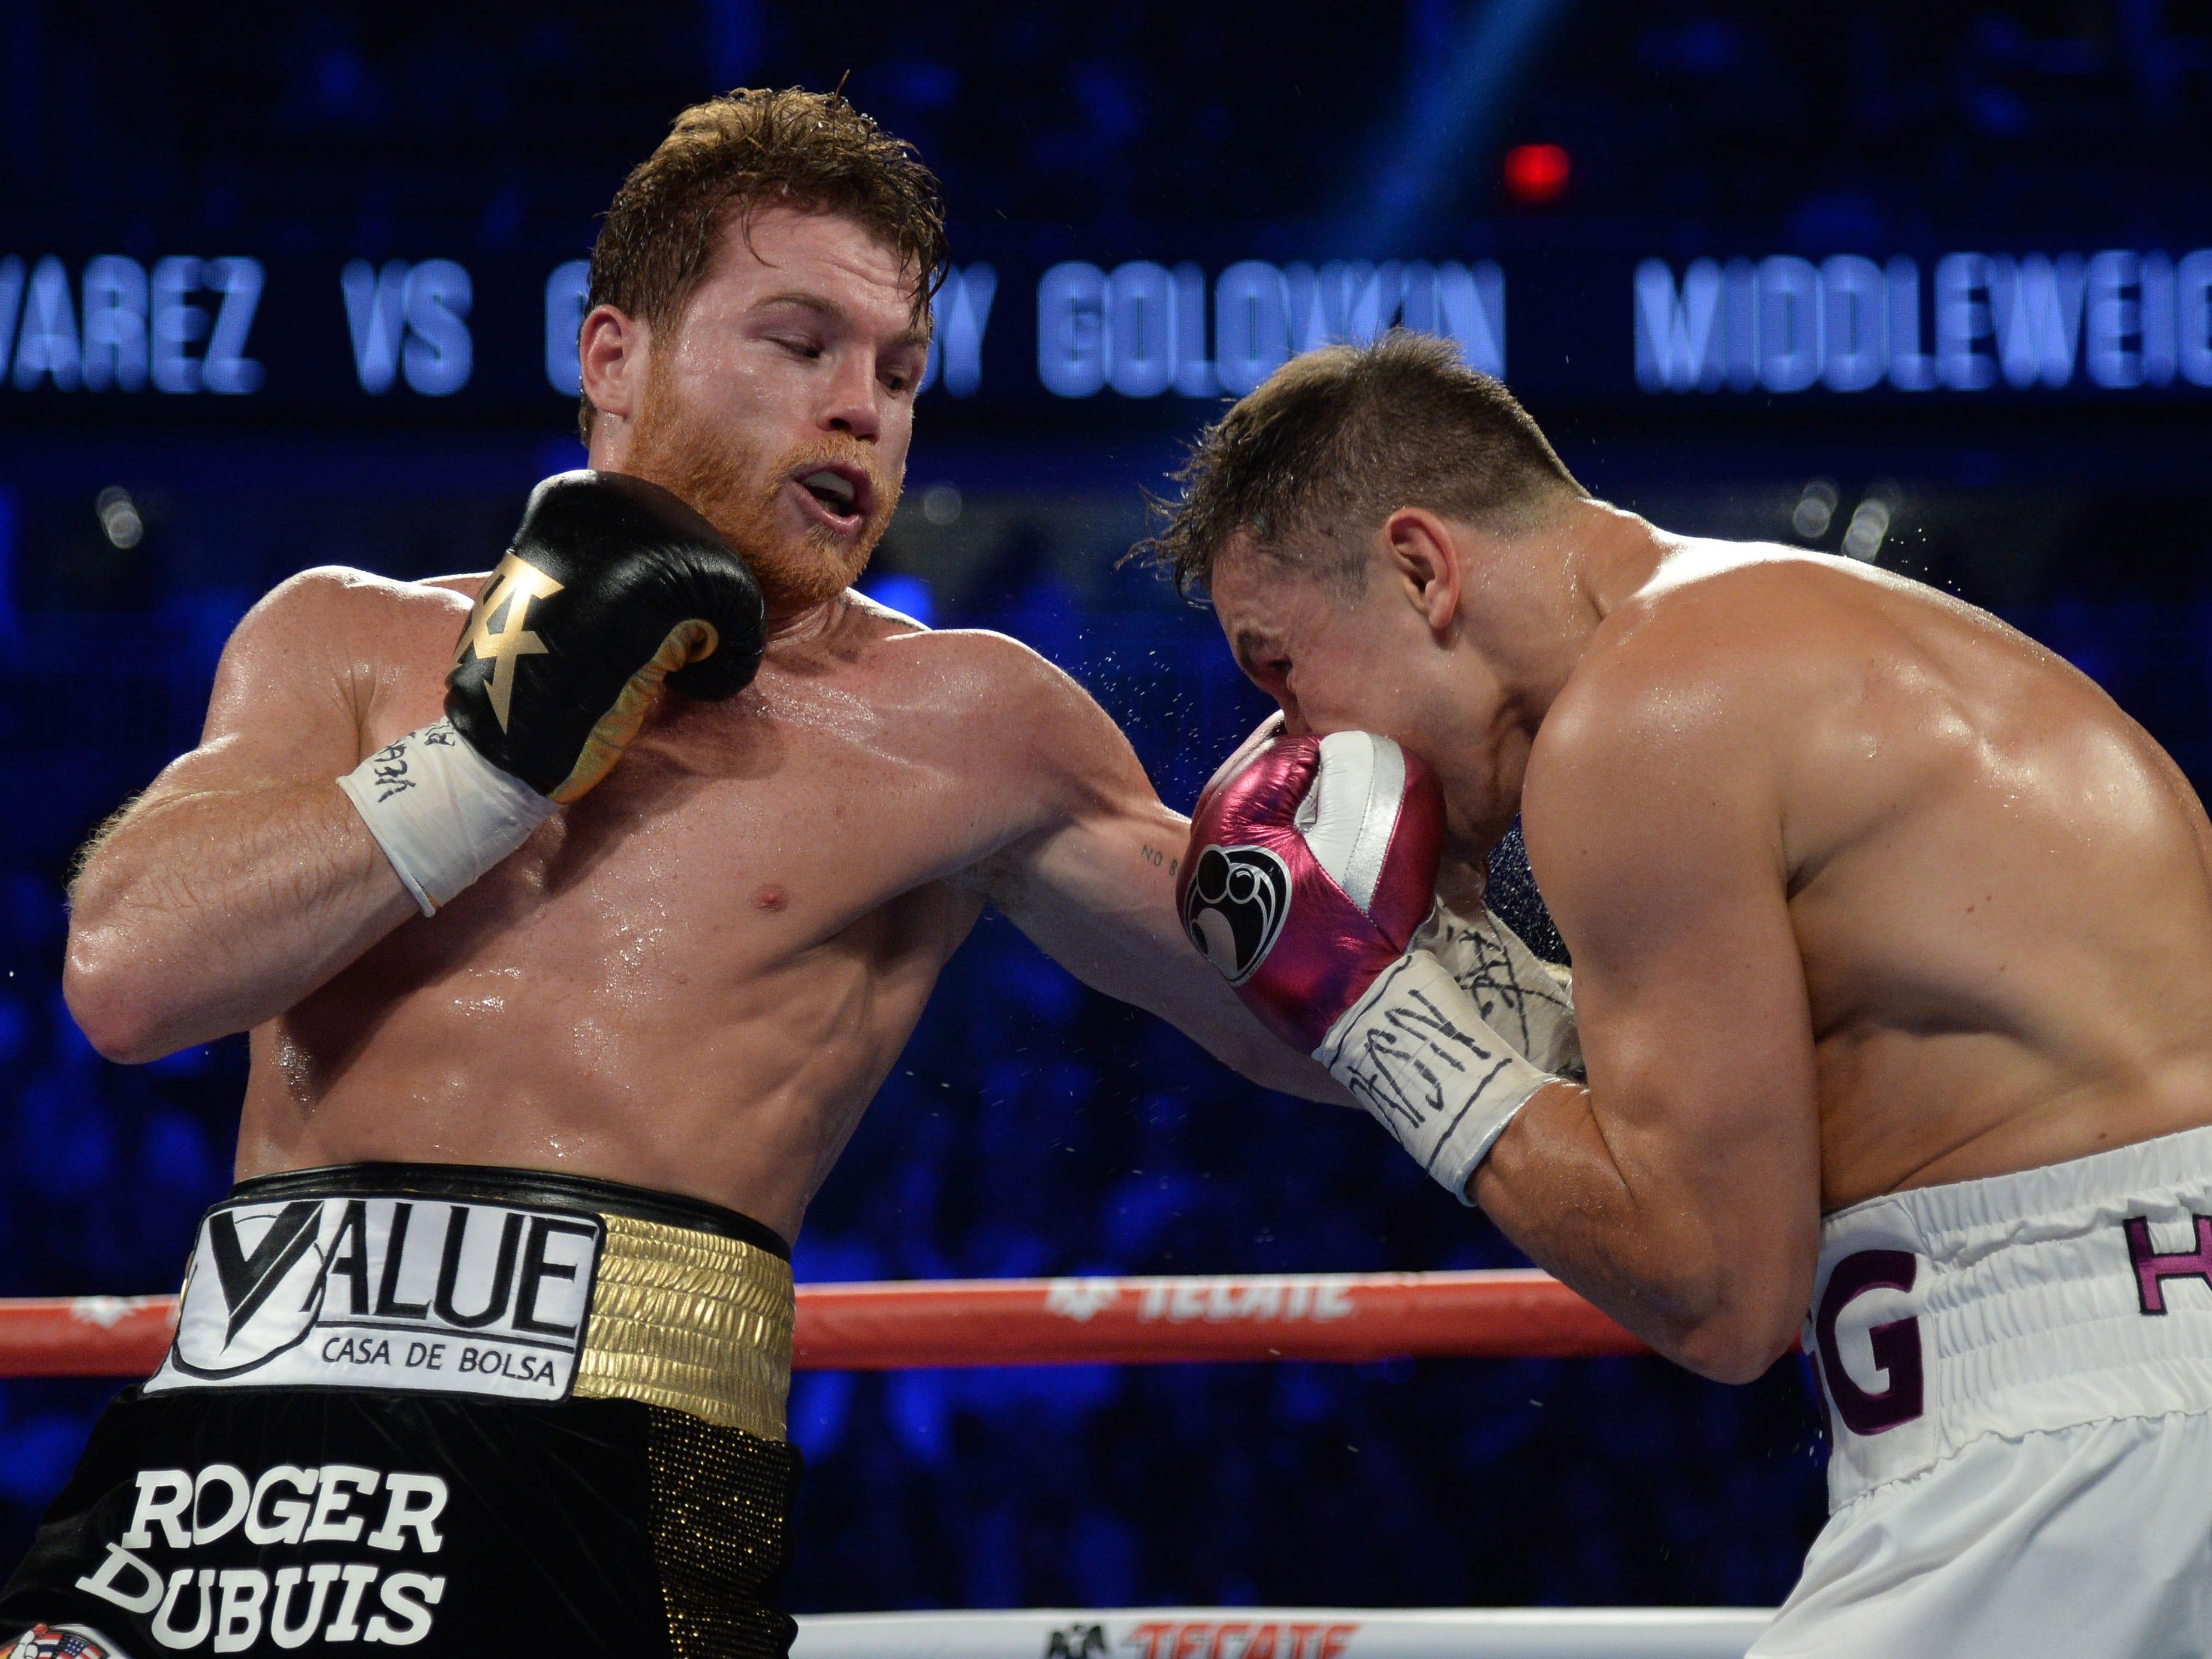 Alvarez throws a punch at Golovkin.